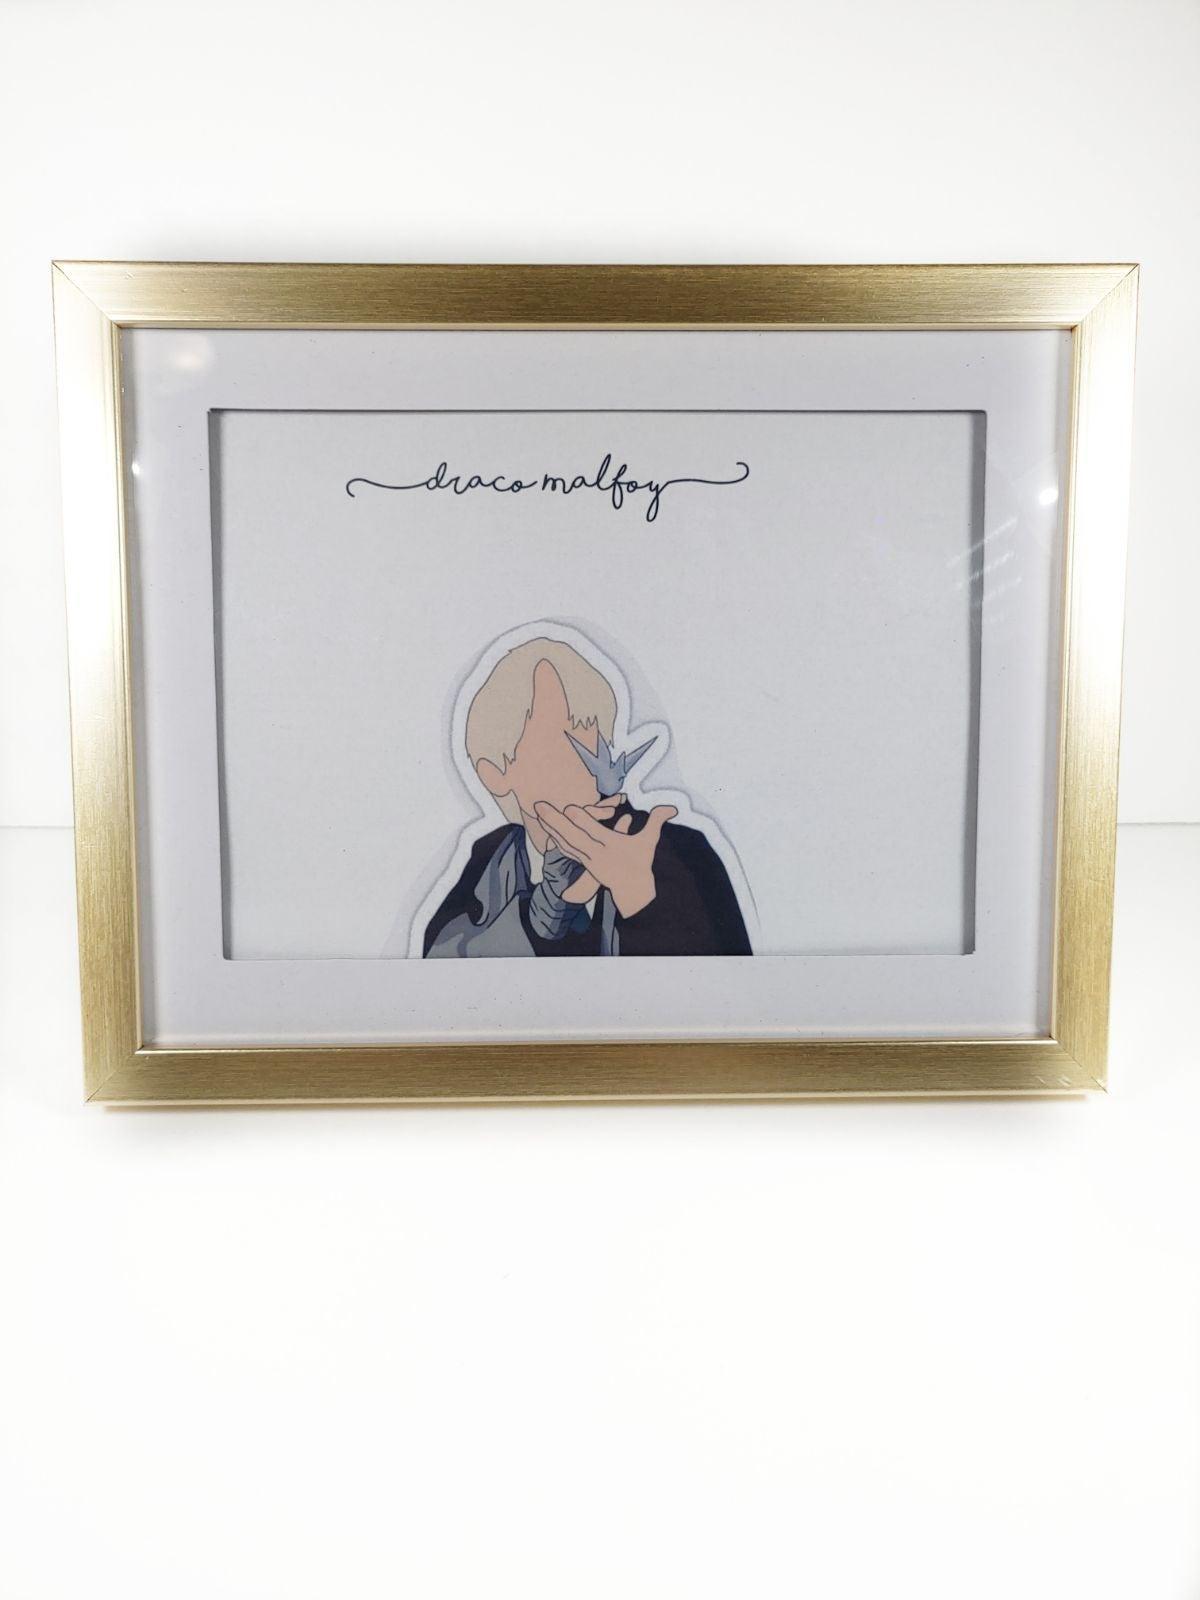 Harry Potter Draco Malfoy  art frame